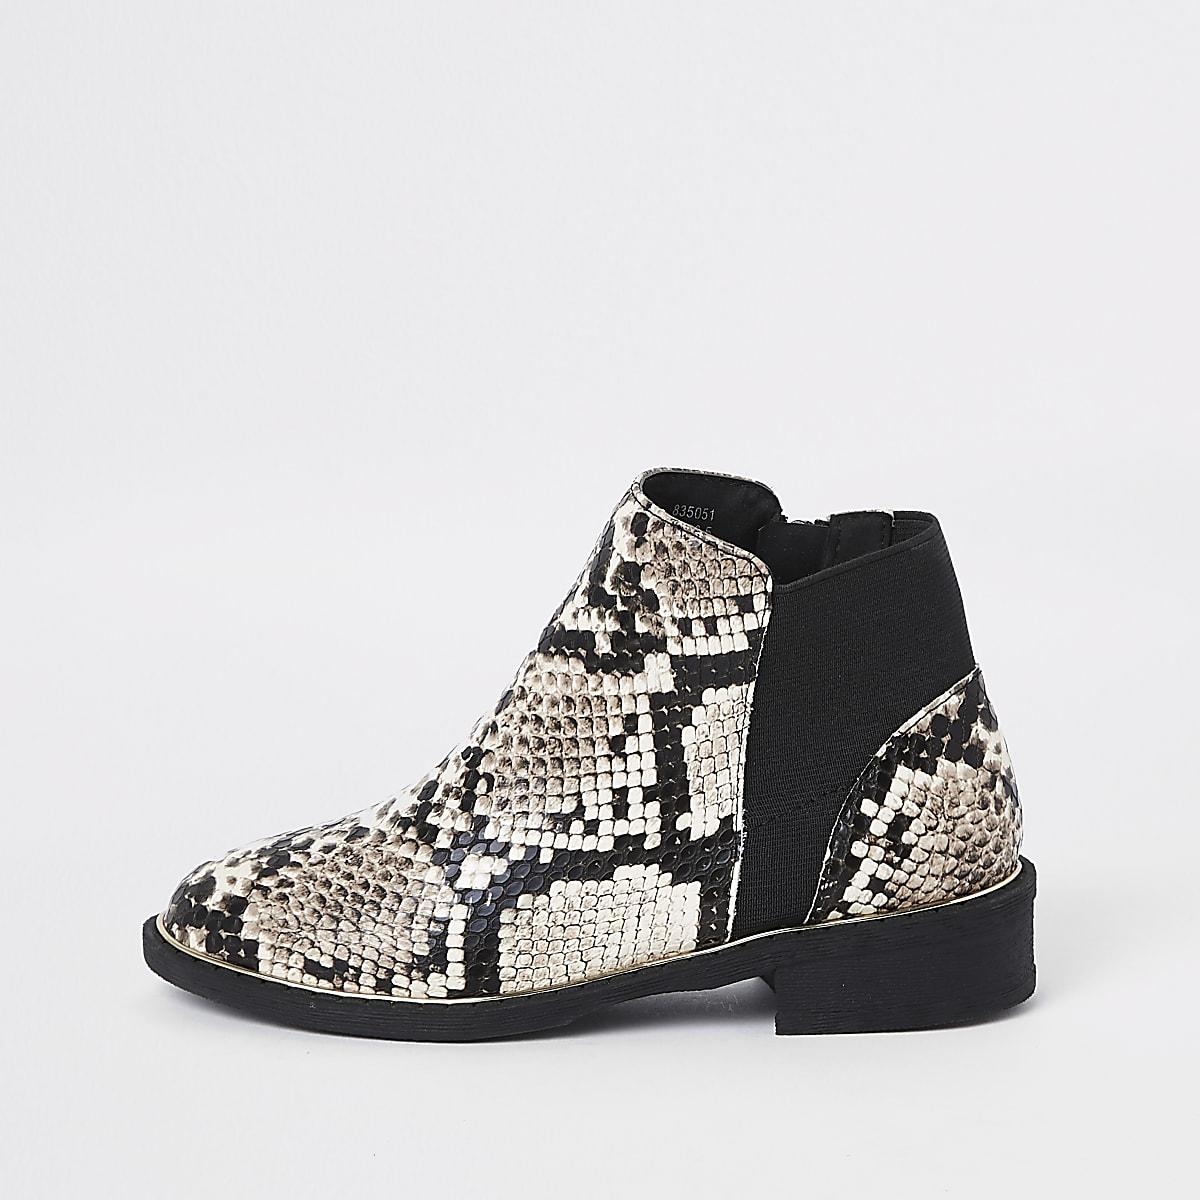 Girls brown snake skin chelsea boots